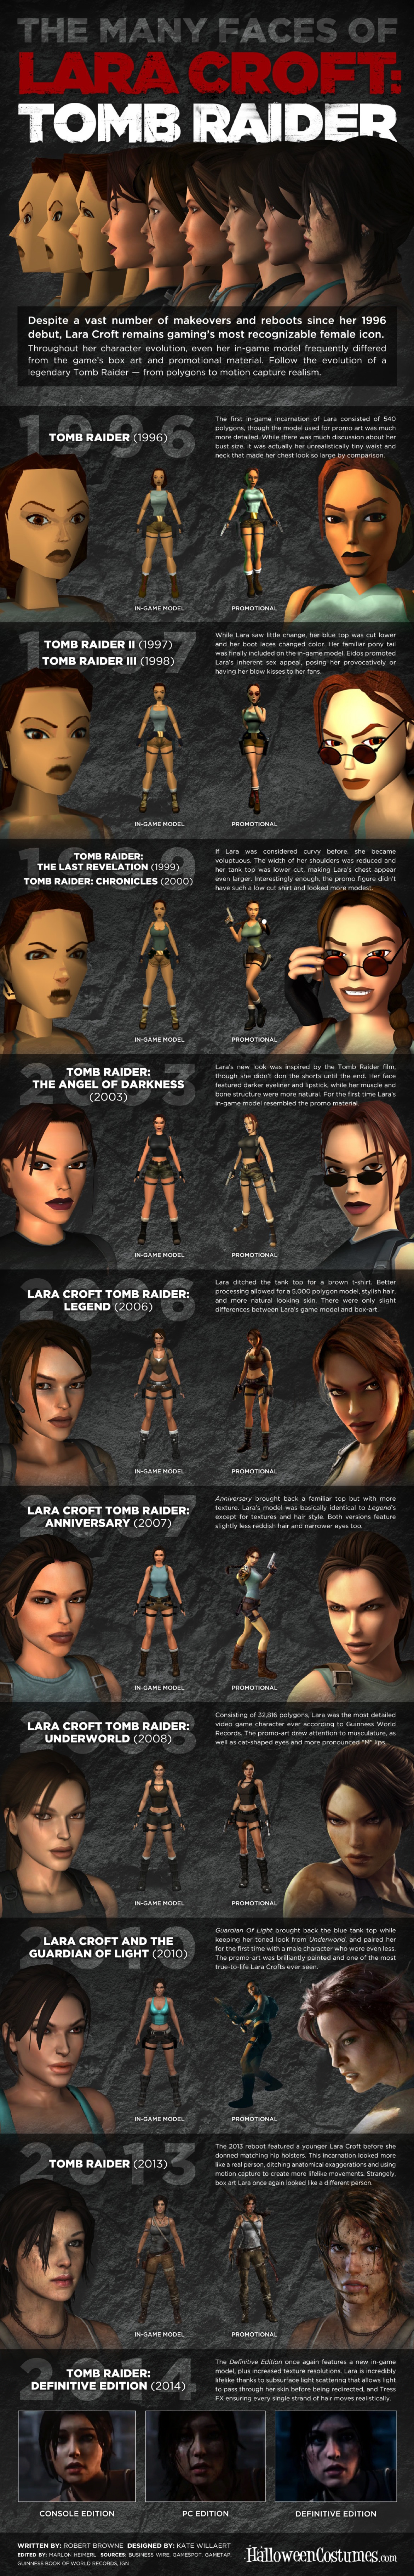 Tomb raider infographic